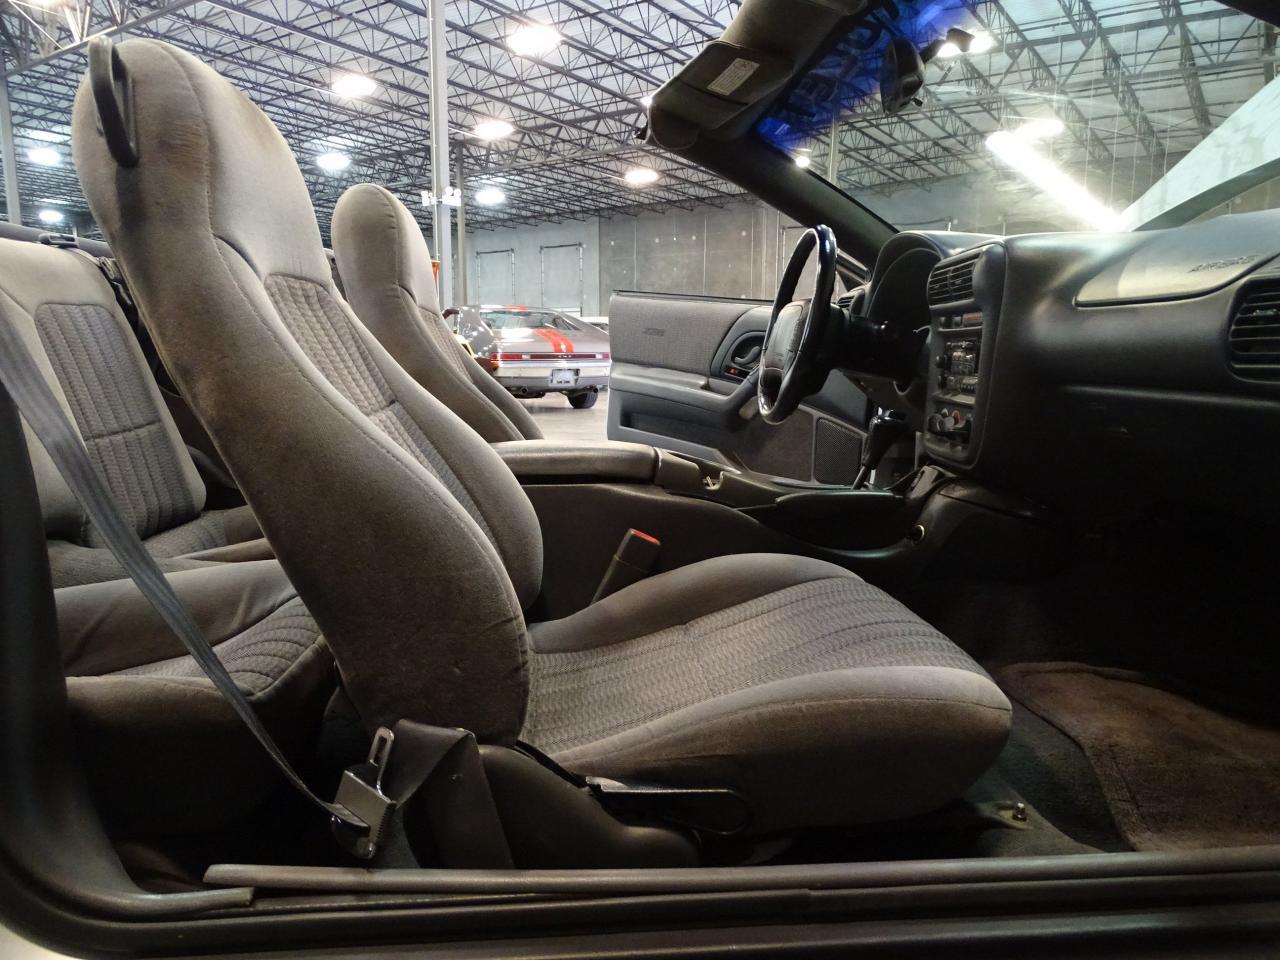 Large Picture of '98 Camaro located in Ruskin Florida - $10,595.00 - KE0X